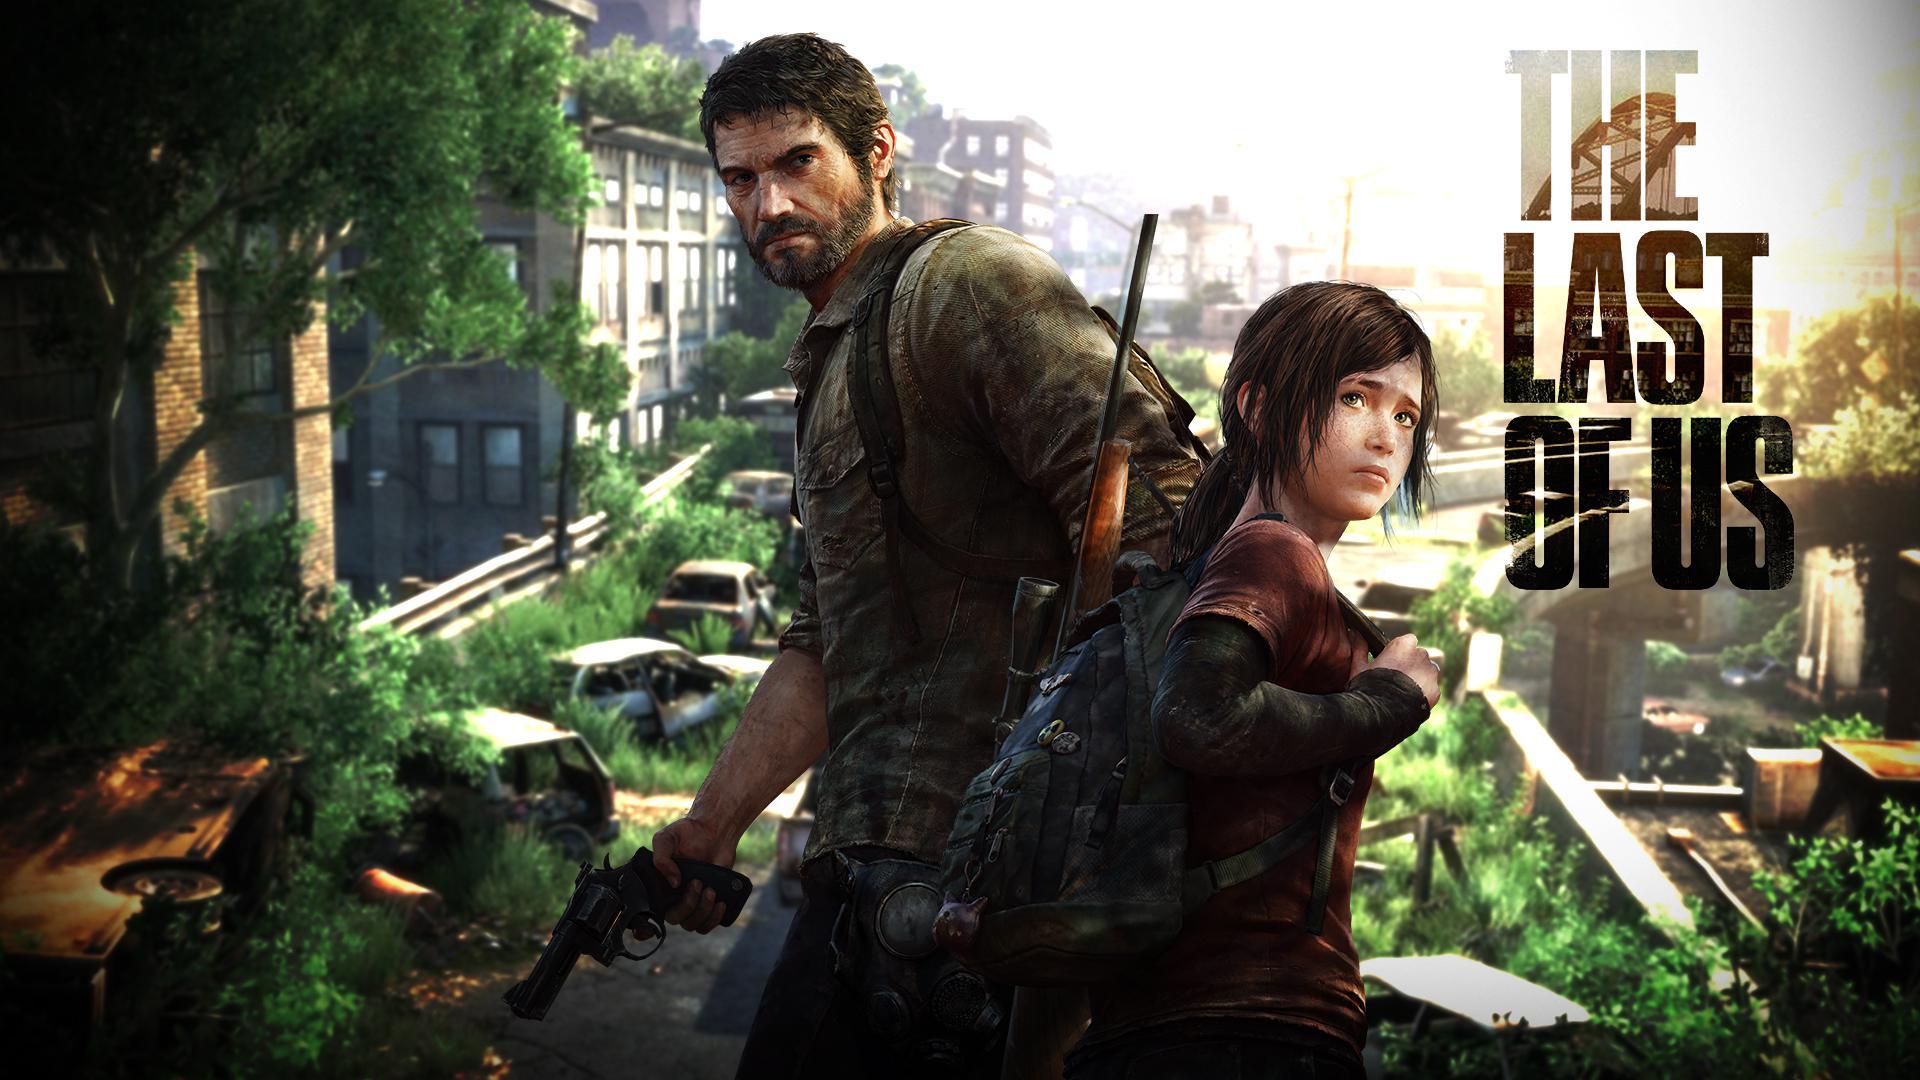 The Last Of Us Wallpaper 1920x1080 67985